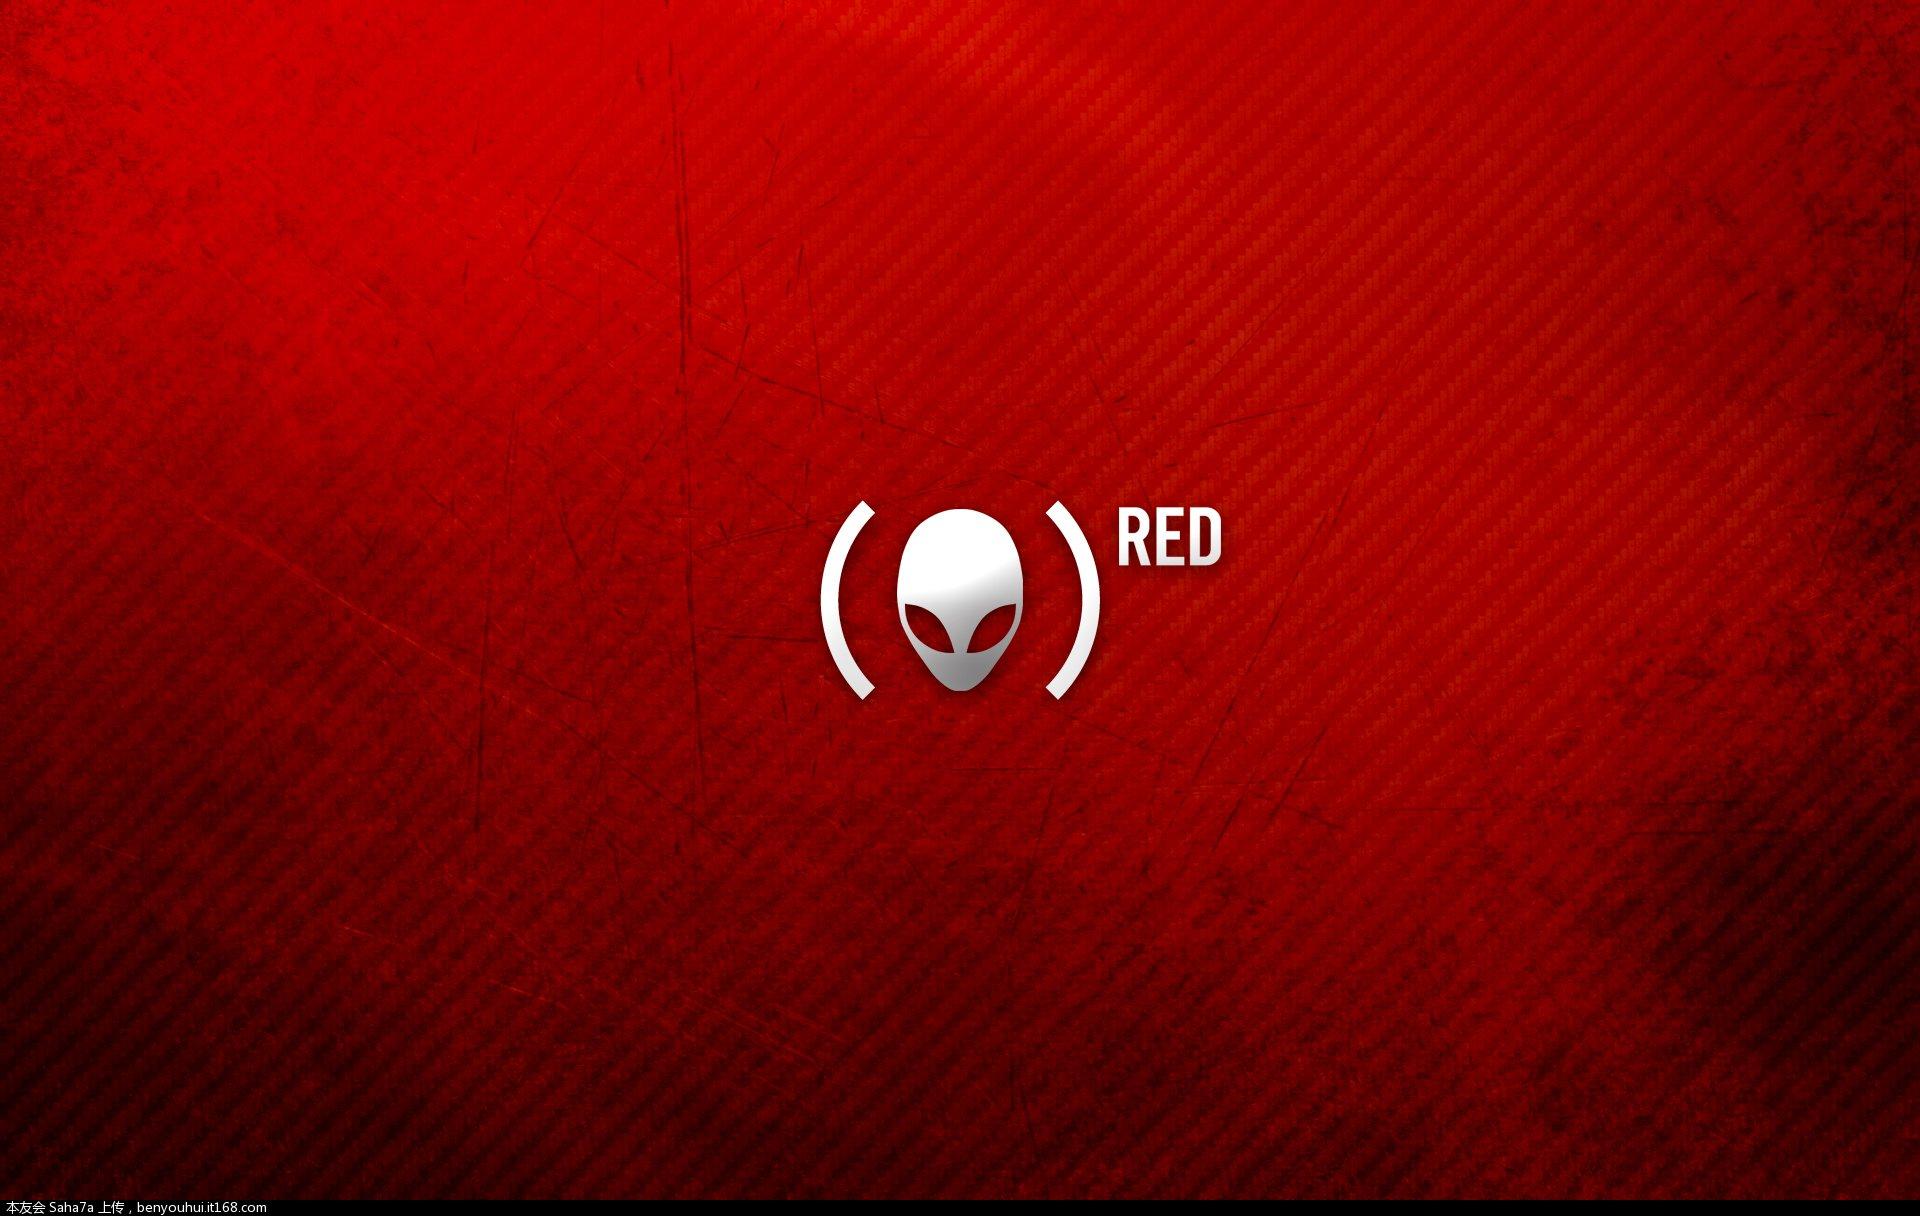 戴尔外星人论坛 69 alienware - 高清壁纸 & alienware 泡泡屏保